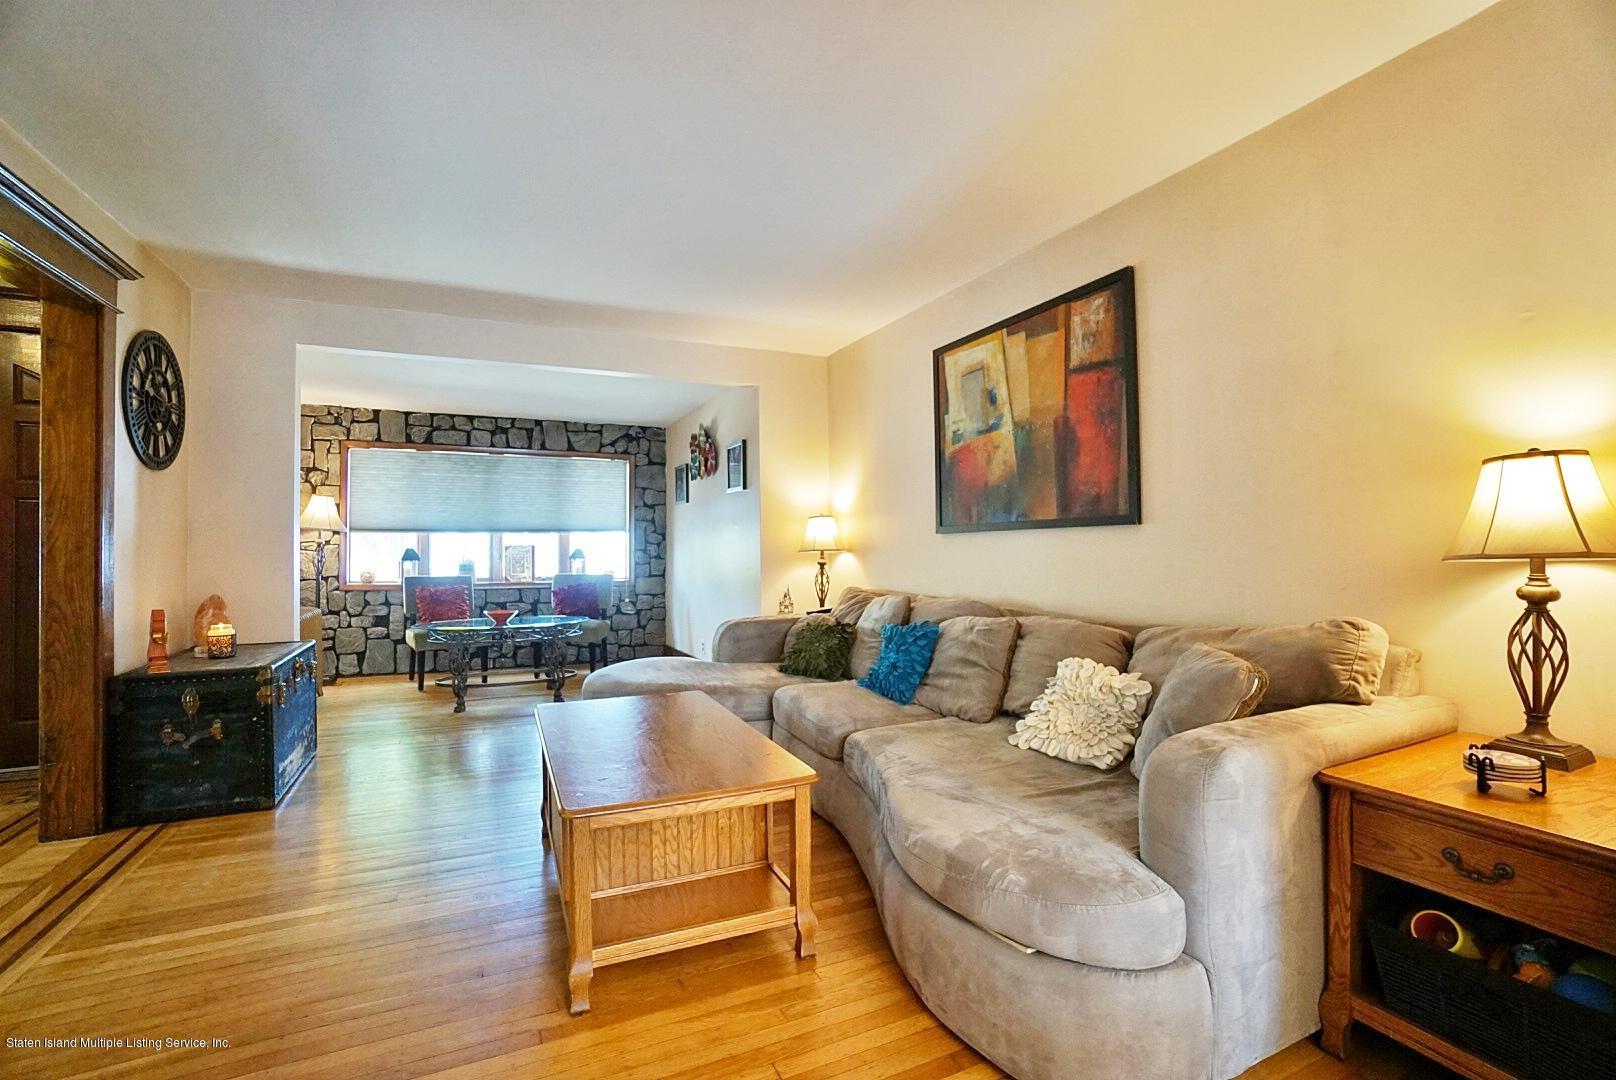 Single Family - Detached 22 Maine Avenue  Staten Island, NY 10314, MLS-1128323-20